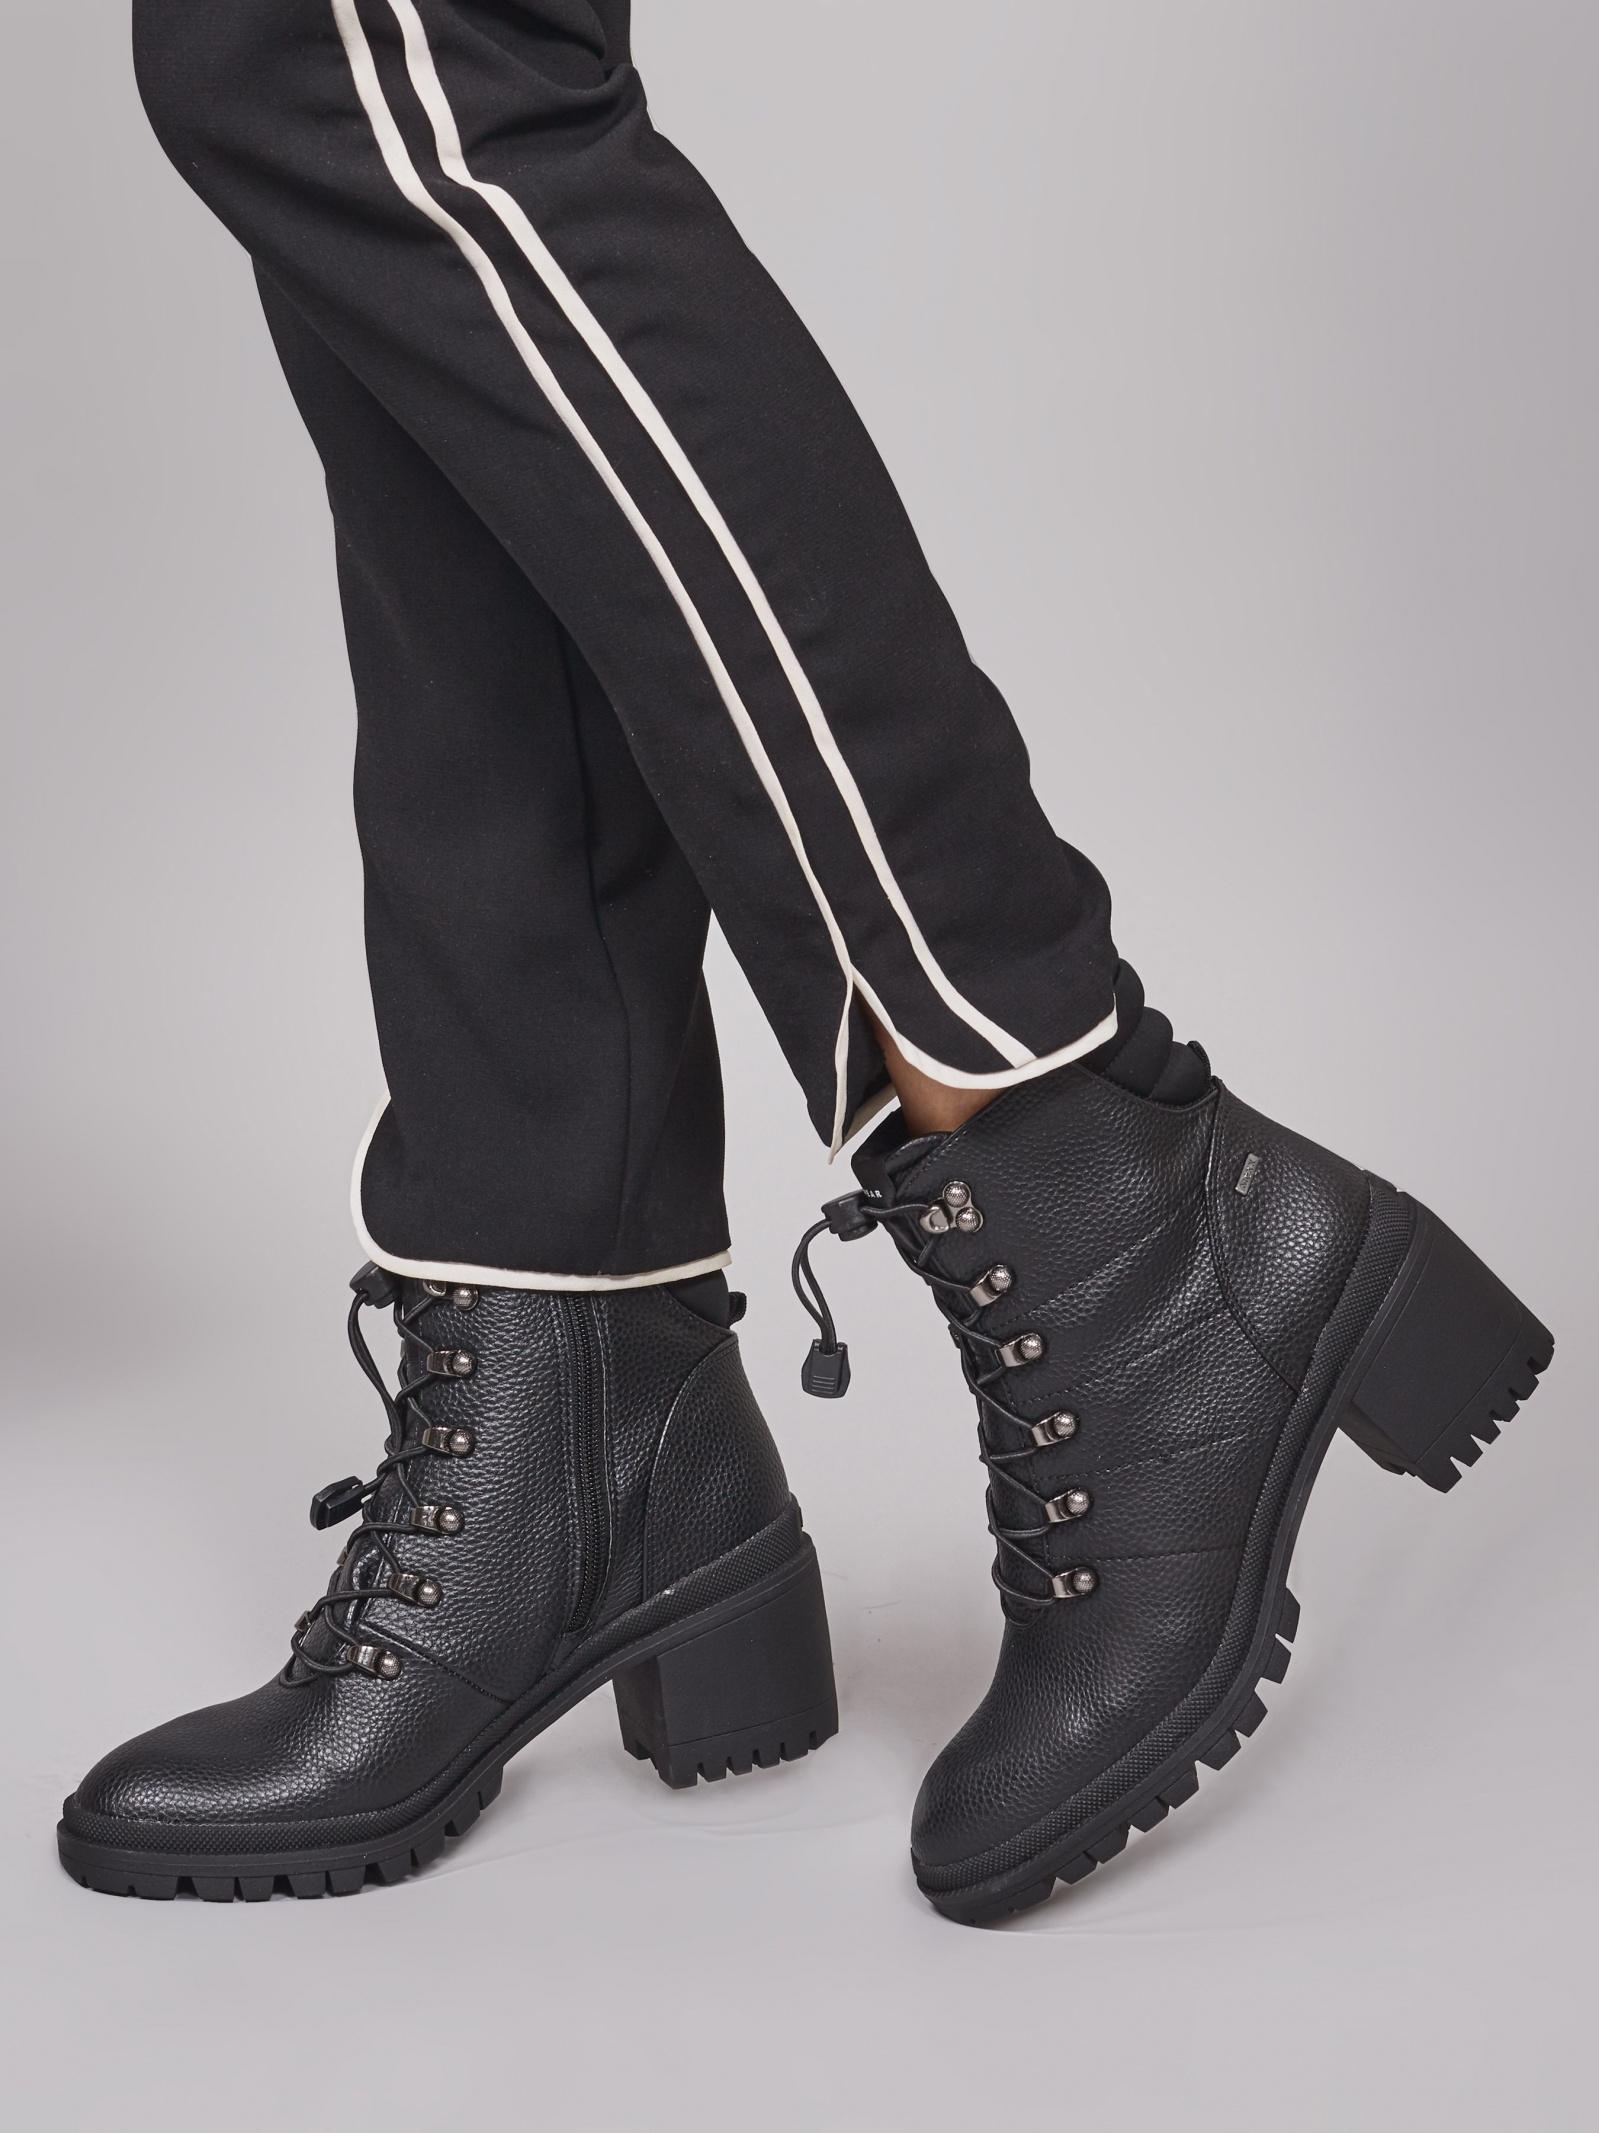 Ботинки для женщин MEXX 7L71 размерная сетка обуви, 2017